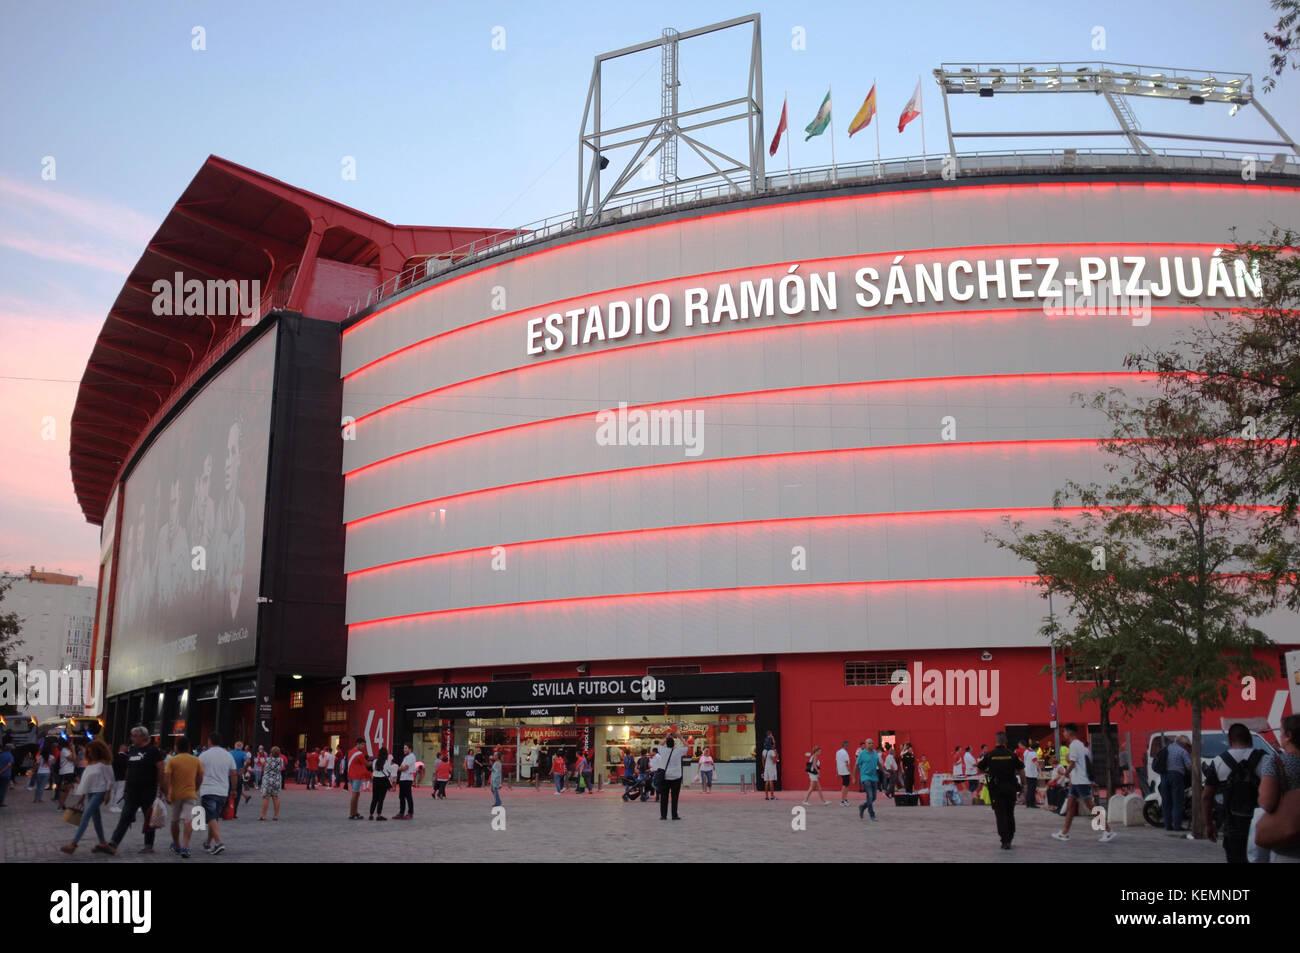 Exterior Of The Ramon Sanchez Pizjuan Stadium Sevilla Fc Vs Las Palmas Seville Andalucia Spain September 2017 Stock Photo Alamy